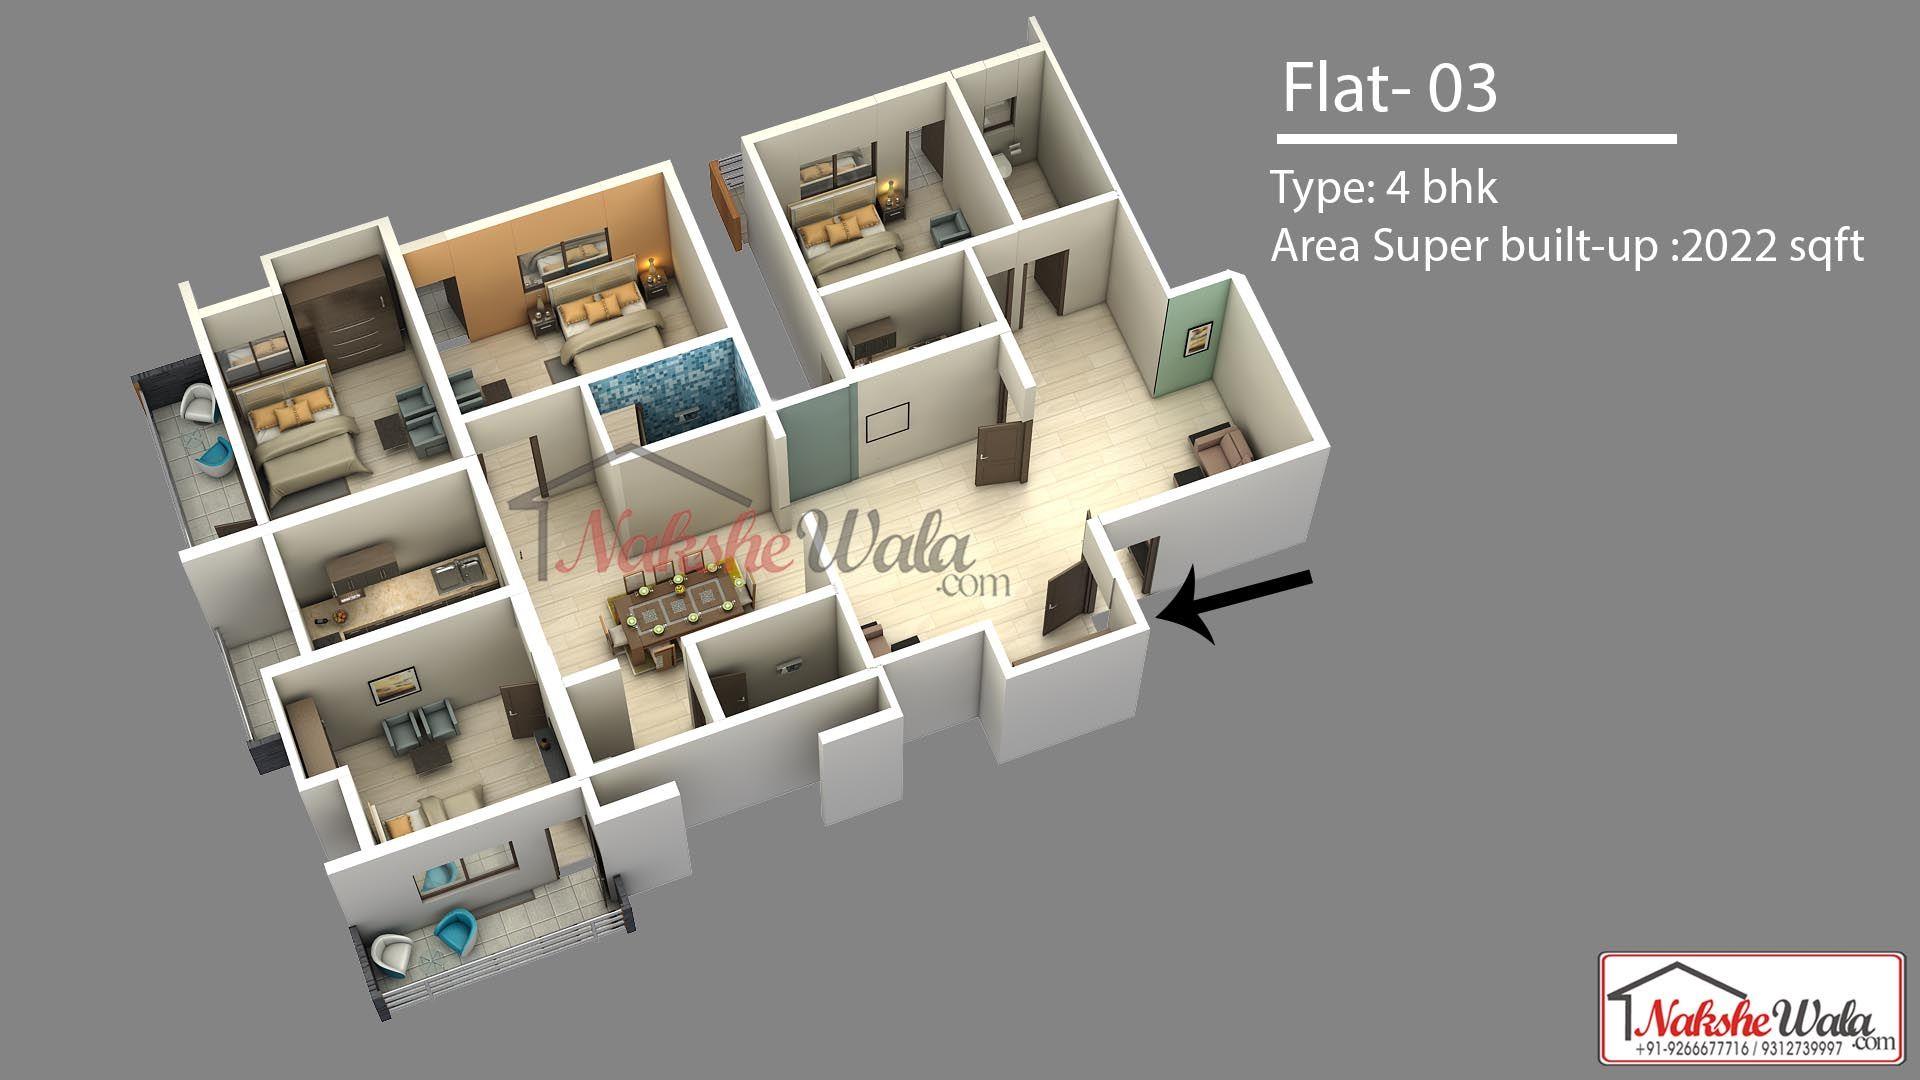 Modern 3d Floor Plan Of 4bhk House Design By Nakshewla Com Floor Plans Floor Plan Design Floor Plans Online